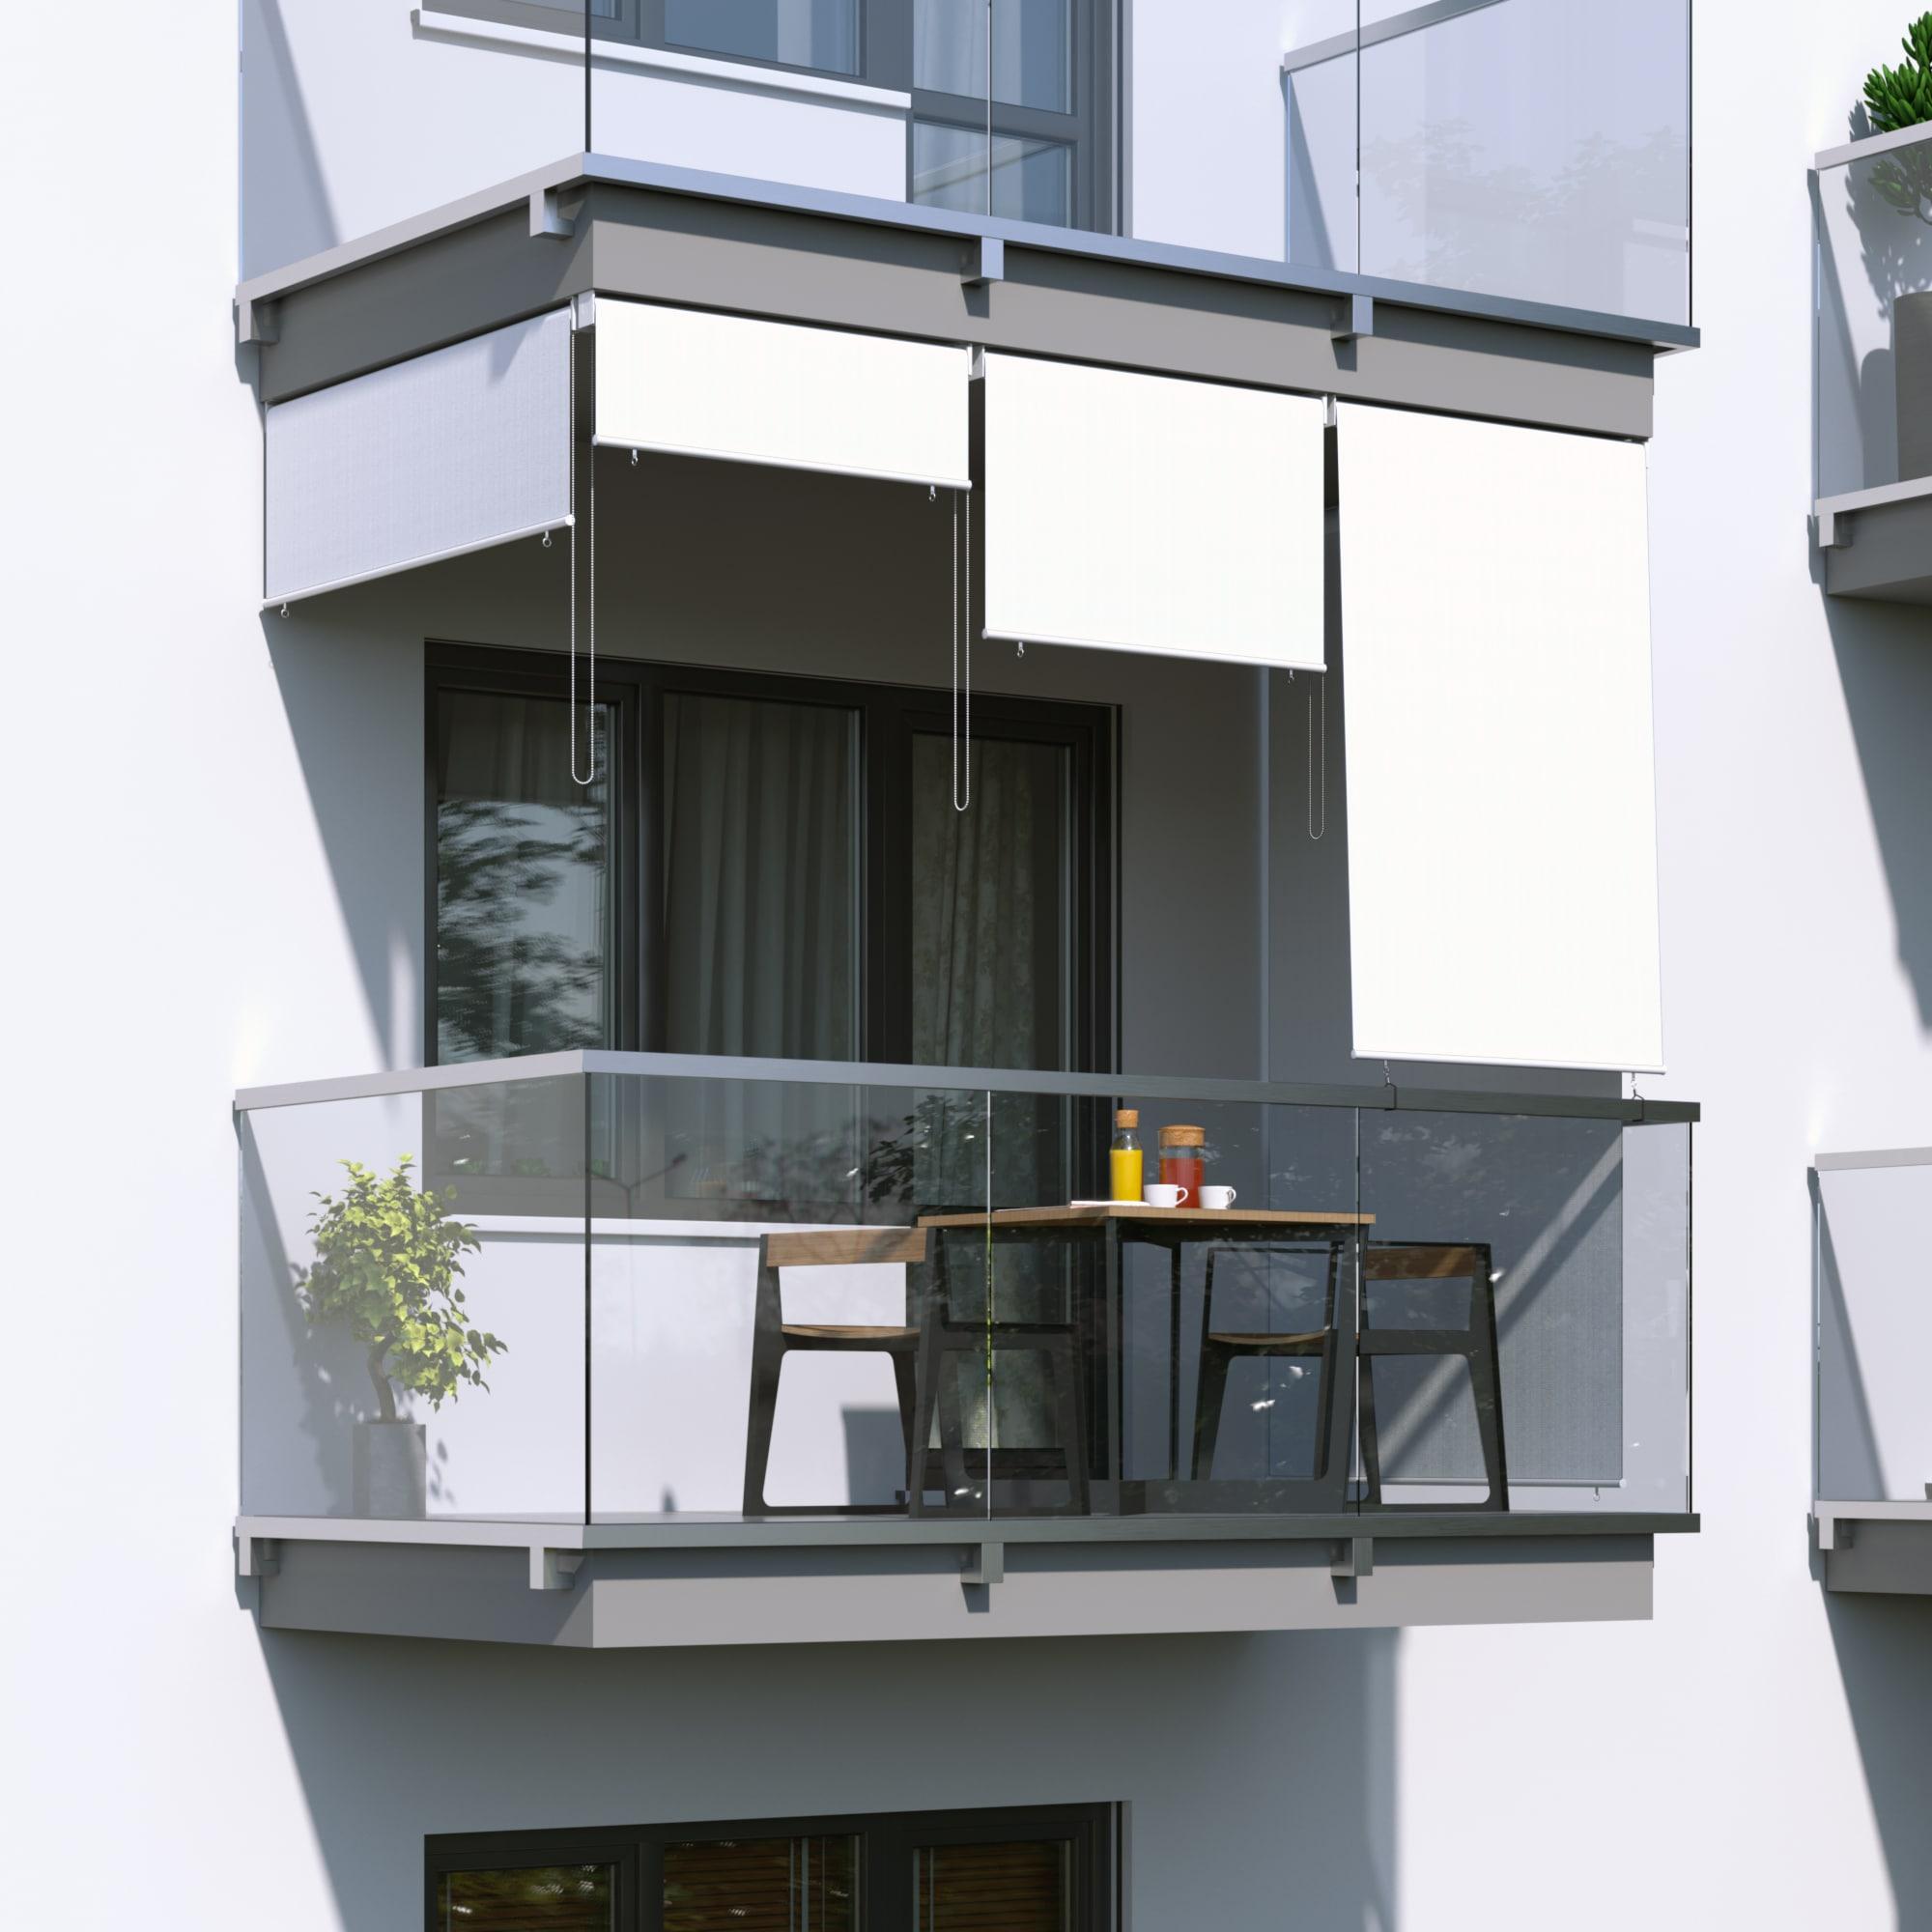 JAROLIFT-Senkrechtmarkise-Sichtschutz-Aussenrollo-Sonnenschutz-Aussen-Rollo-Balkon Indexbild 13